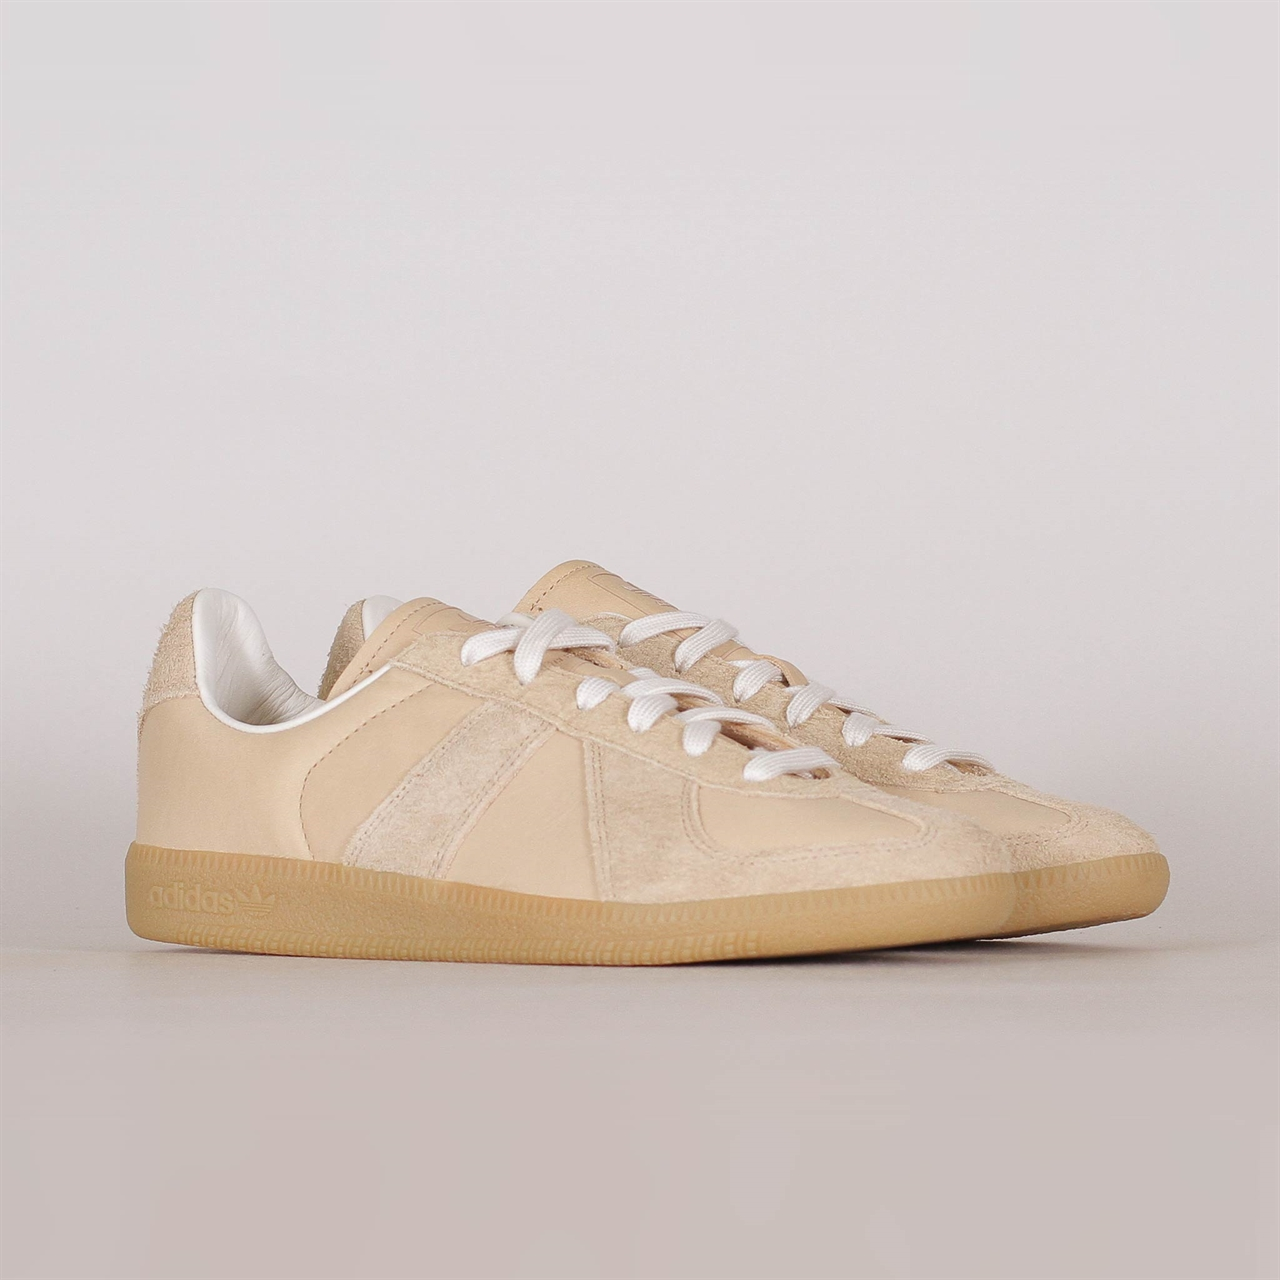 Shelta - Adidas Originals BW Army (B44639)